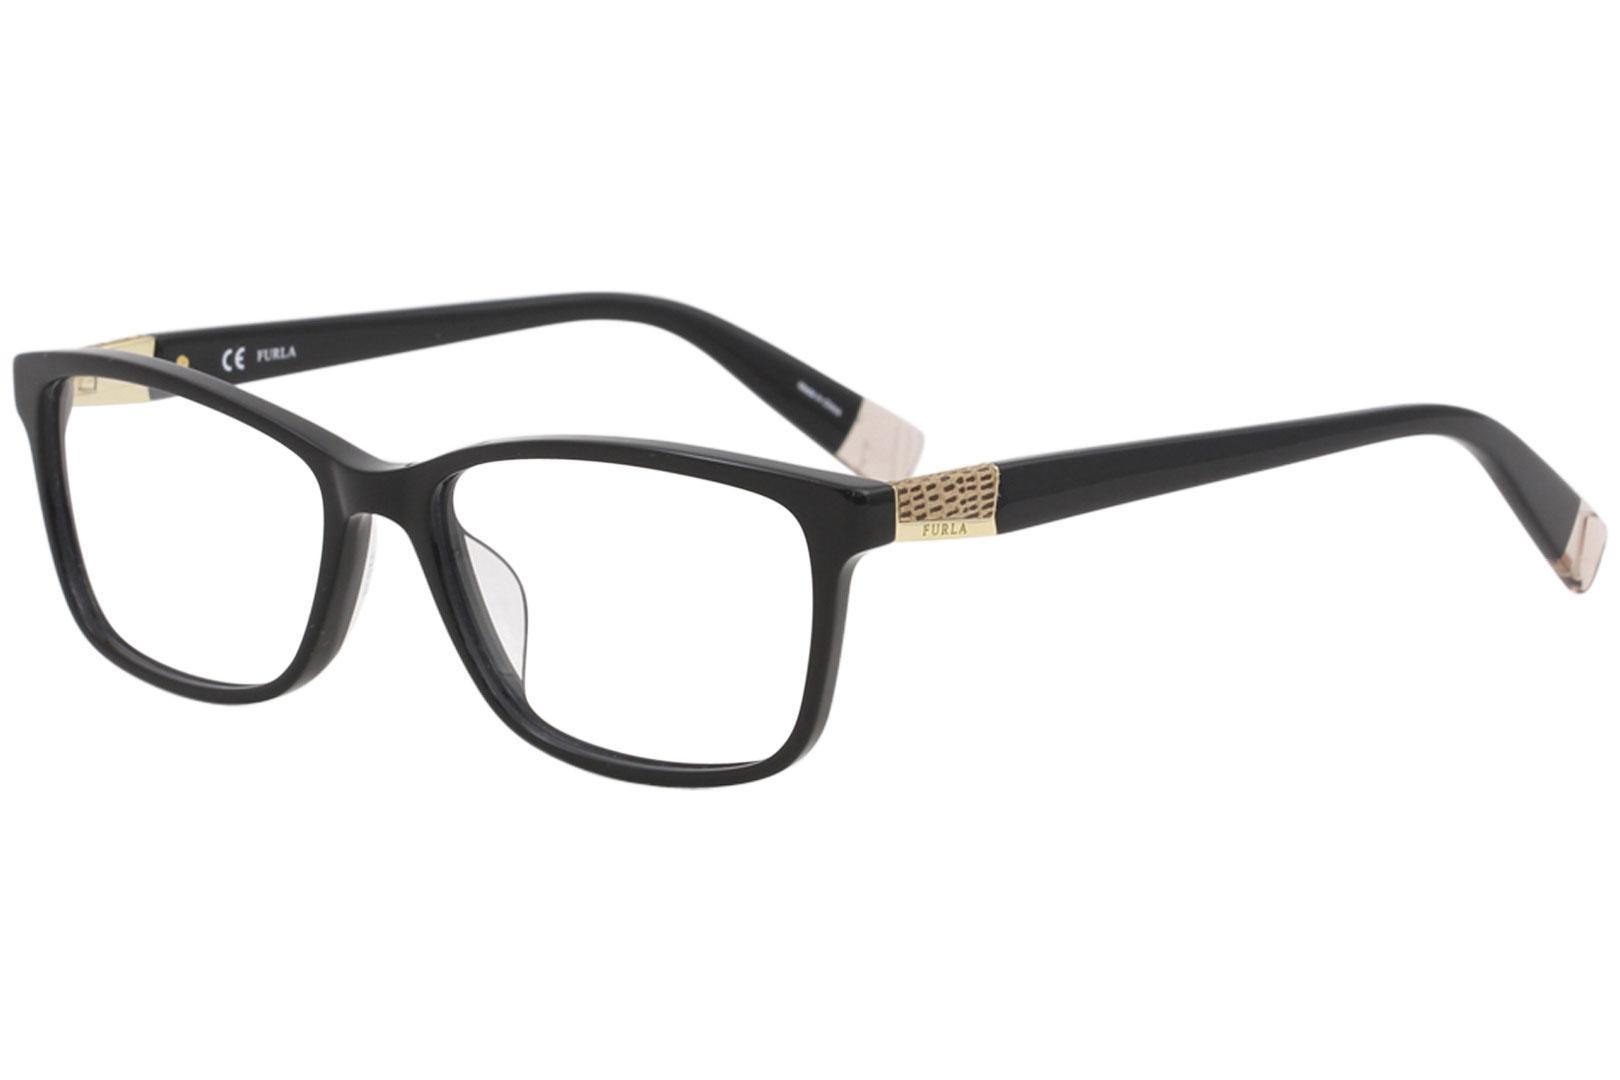 Image of Furla Women's Eyeglasses VFU005 VFU/005 700Y Black Full Rim Optical Frame 53mm - Black   700Y - Lens 53 Bridge 16 B 36 ED 58 Temple 140